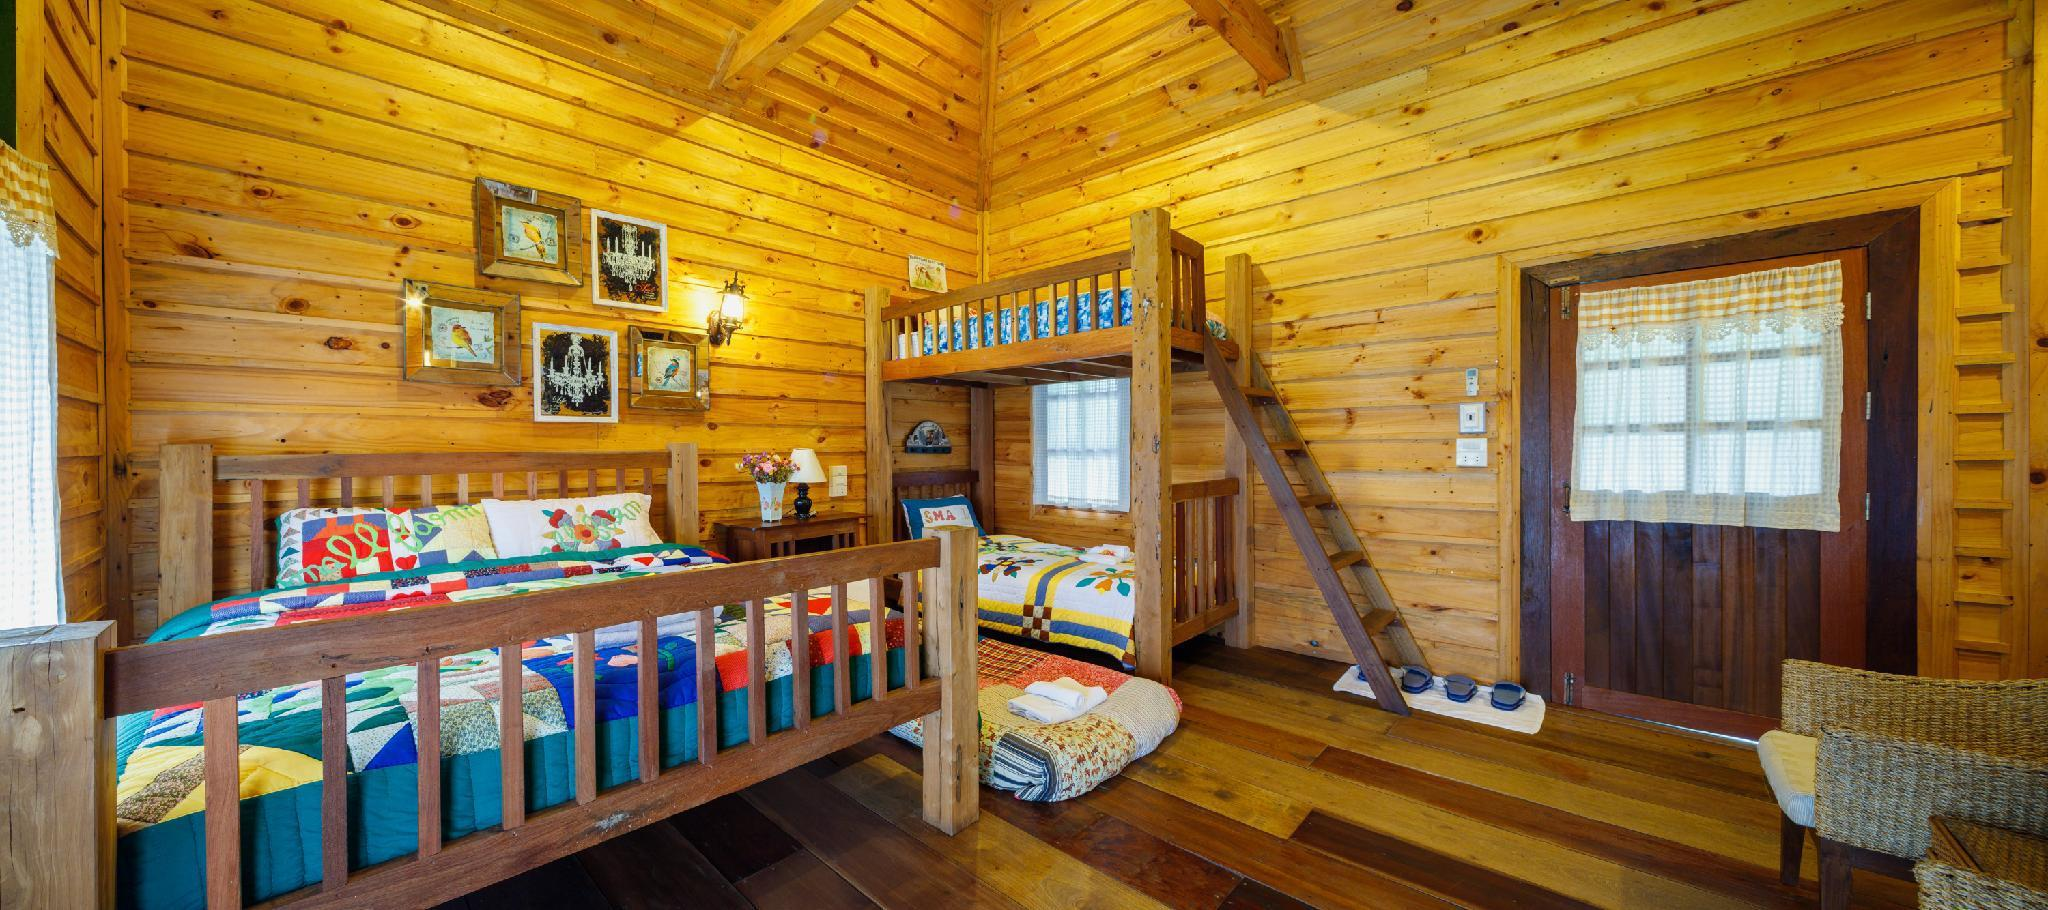 Farm Paradise Resort 11BR Sleeps 32 w/Animal-Camp วิลลา 11 ห้องนอน 11 ห้องน้ำส่วนตัว ขนาด 9900 ตร.ม. – ข่วงเปา